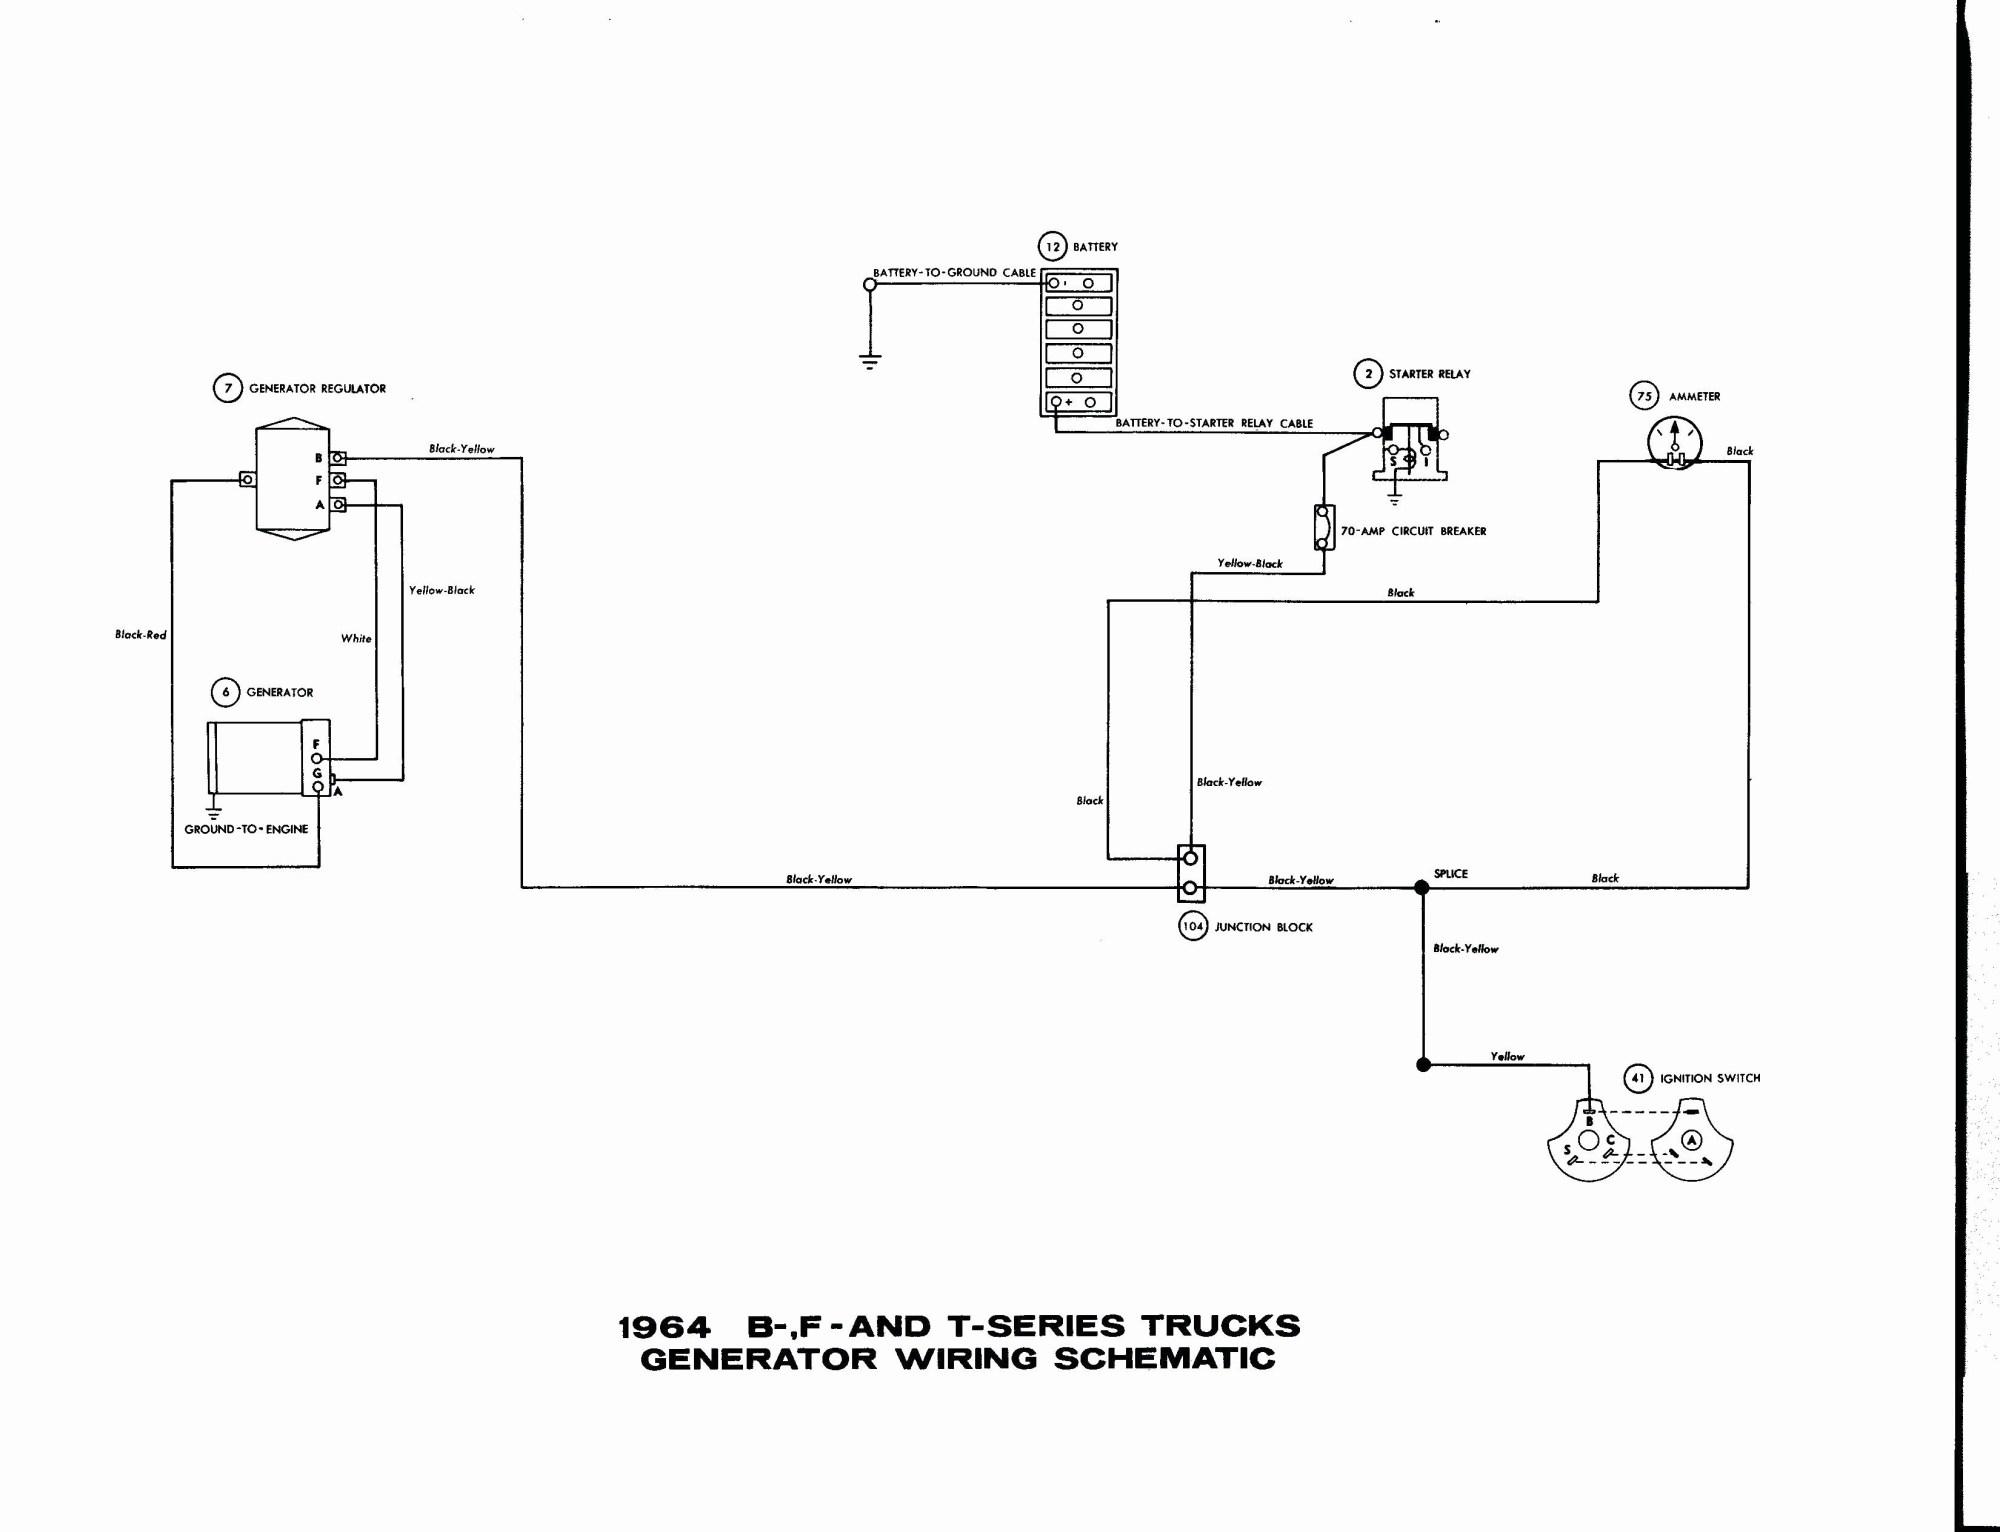 hight resolution of powermaster alternator wiring diagram wirings diagram lincoln powermaster alternator wiring diagram 1998